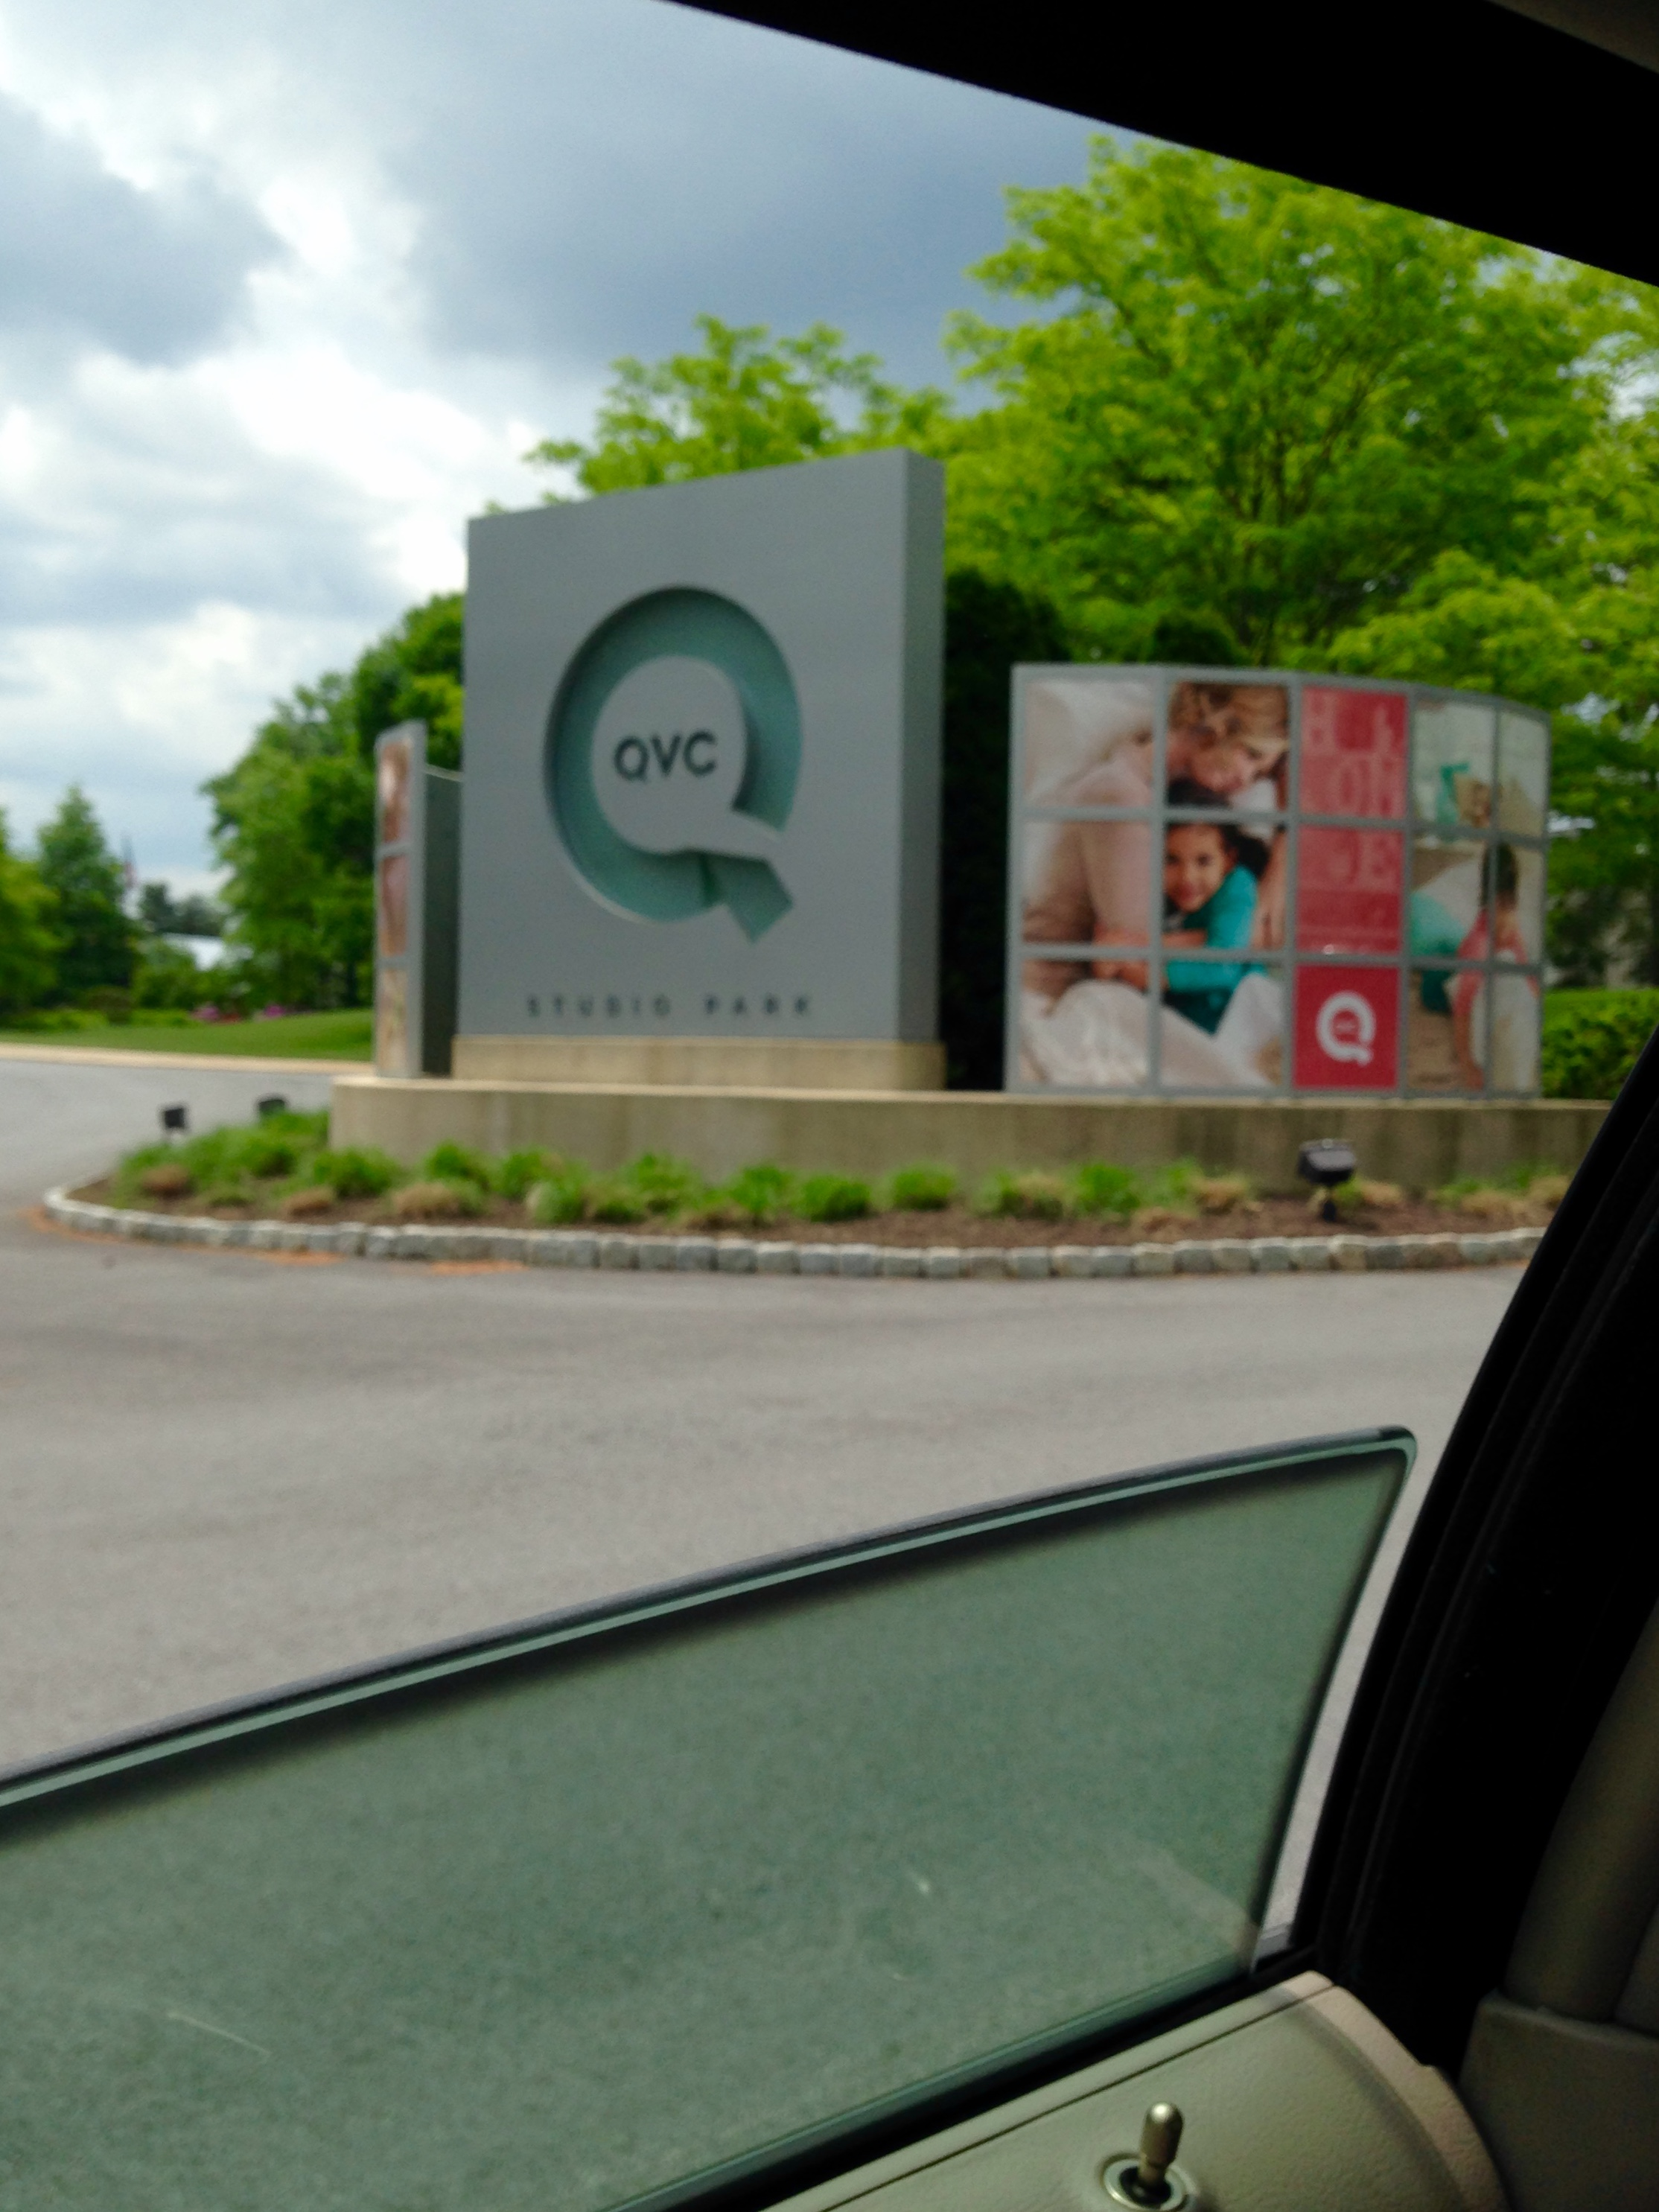 First trip to QVC, 5/18/15.